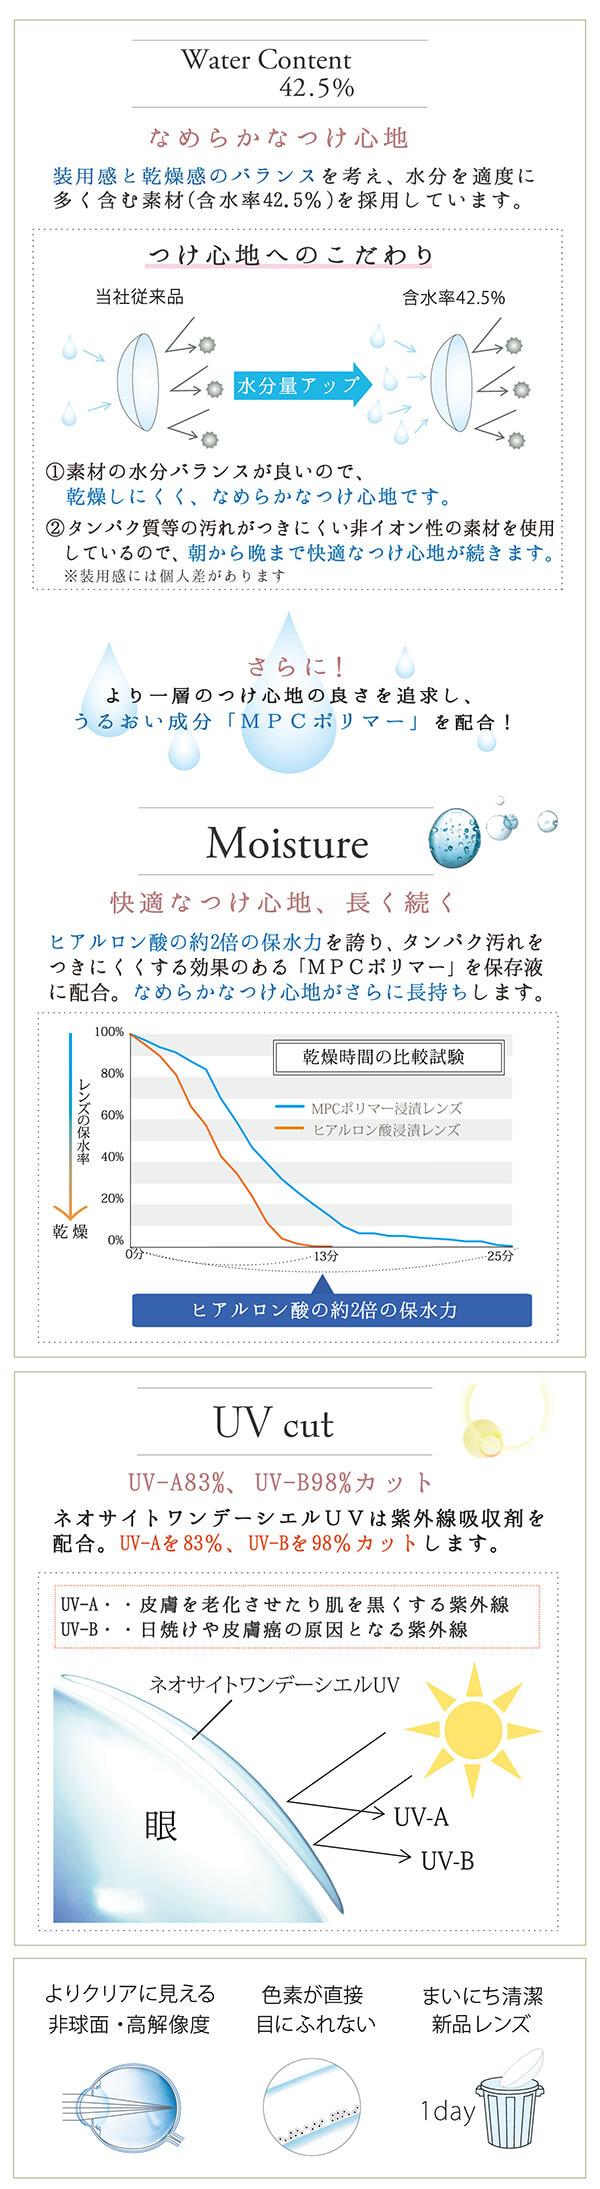 含水率42.5%、UVcut